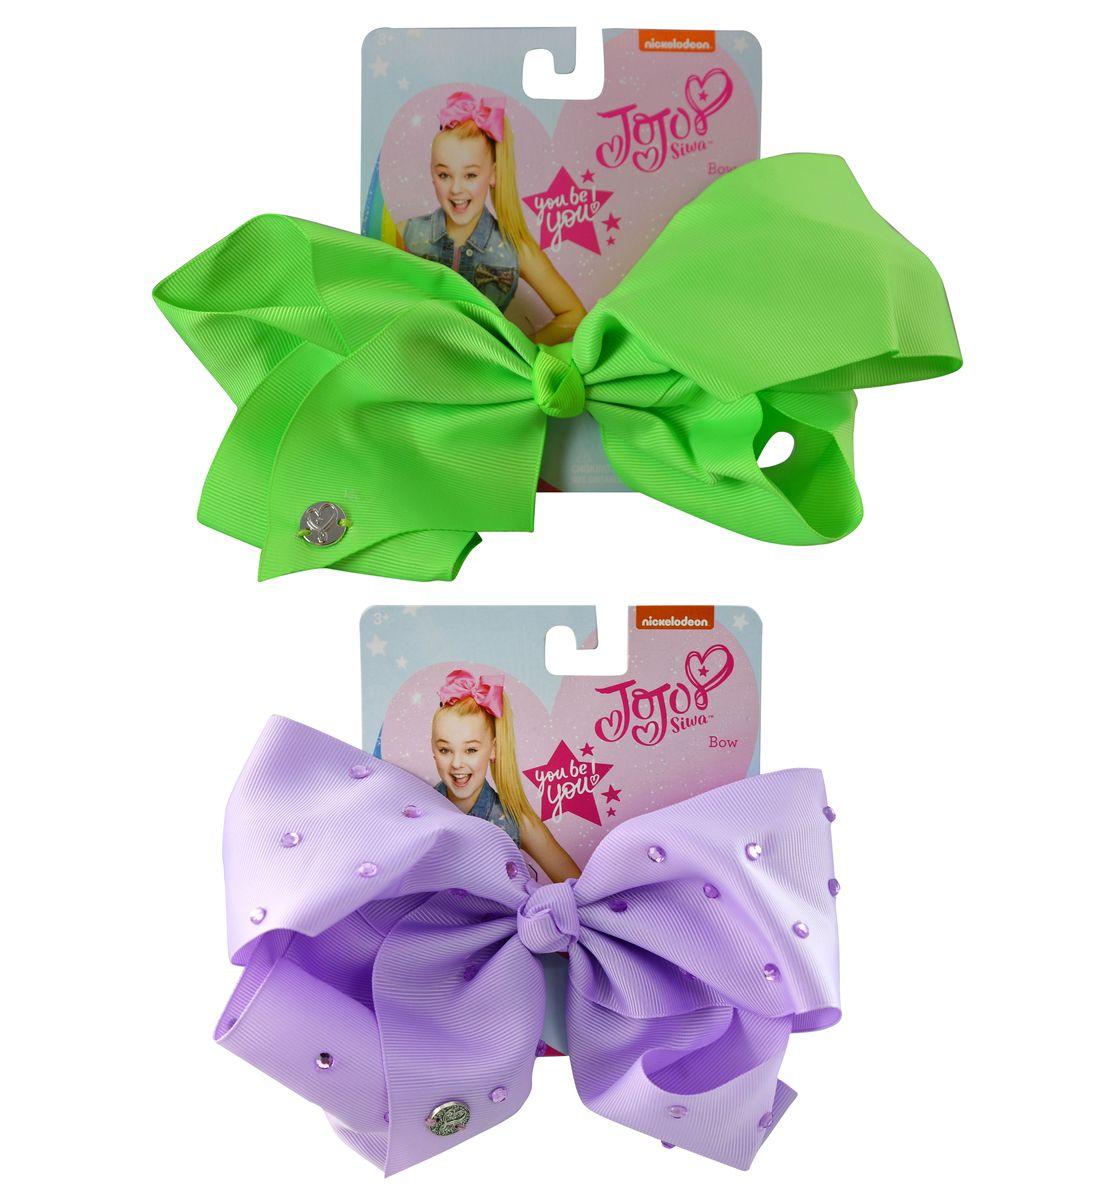 Jojo Siwa Large Neon Green and Purple Rhinestone Signature Bows (2 Items)